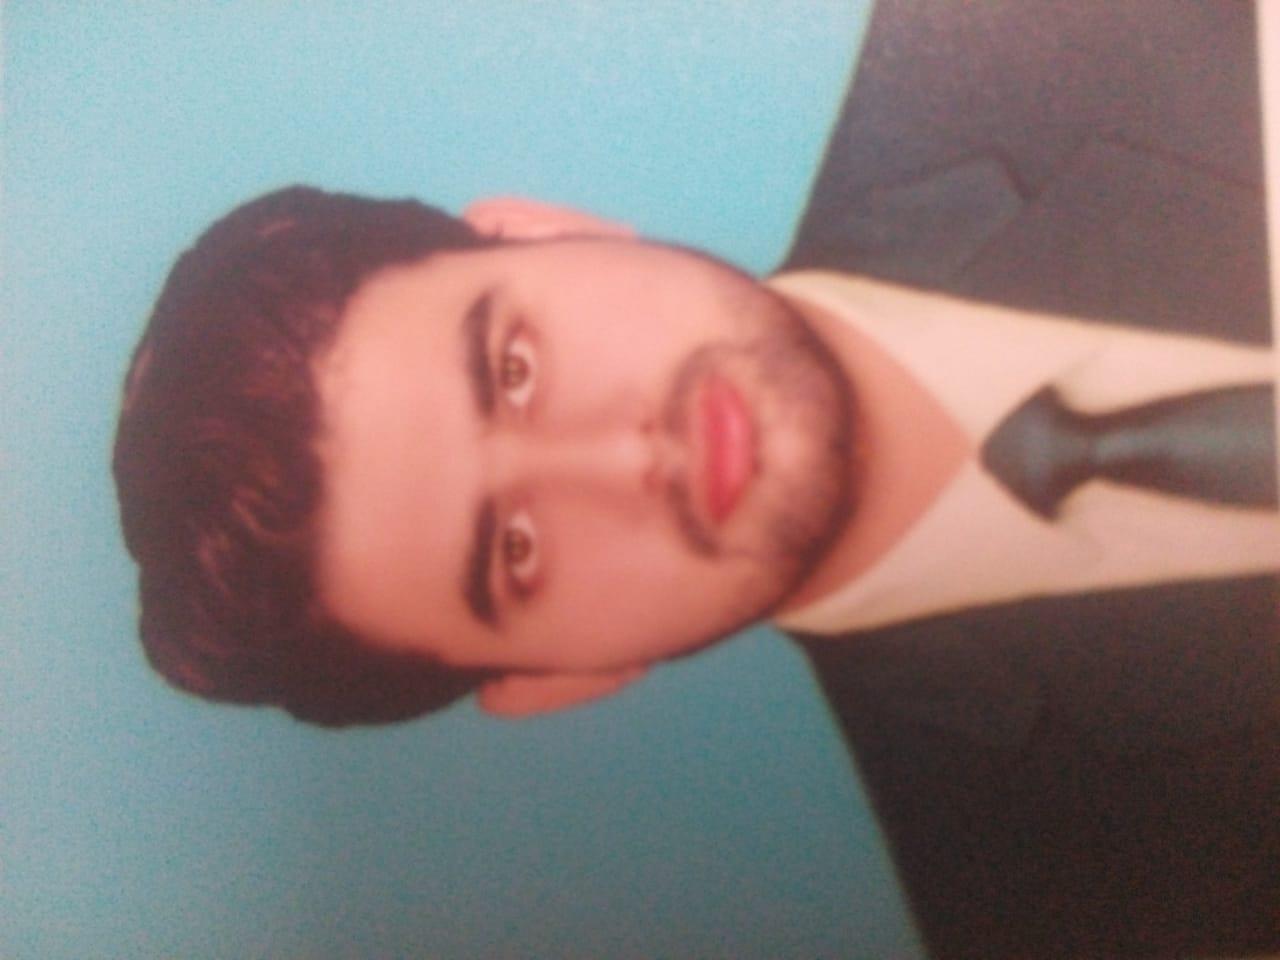 Muhammad Bilal Teaching/Lecturing, SQL, HTML, CSS3